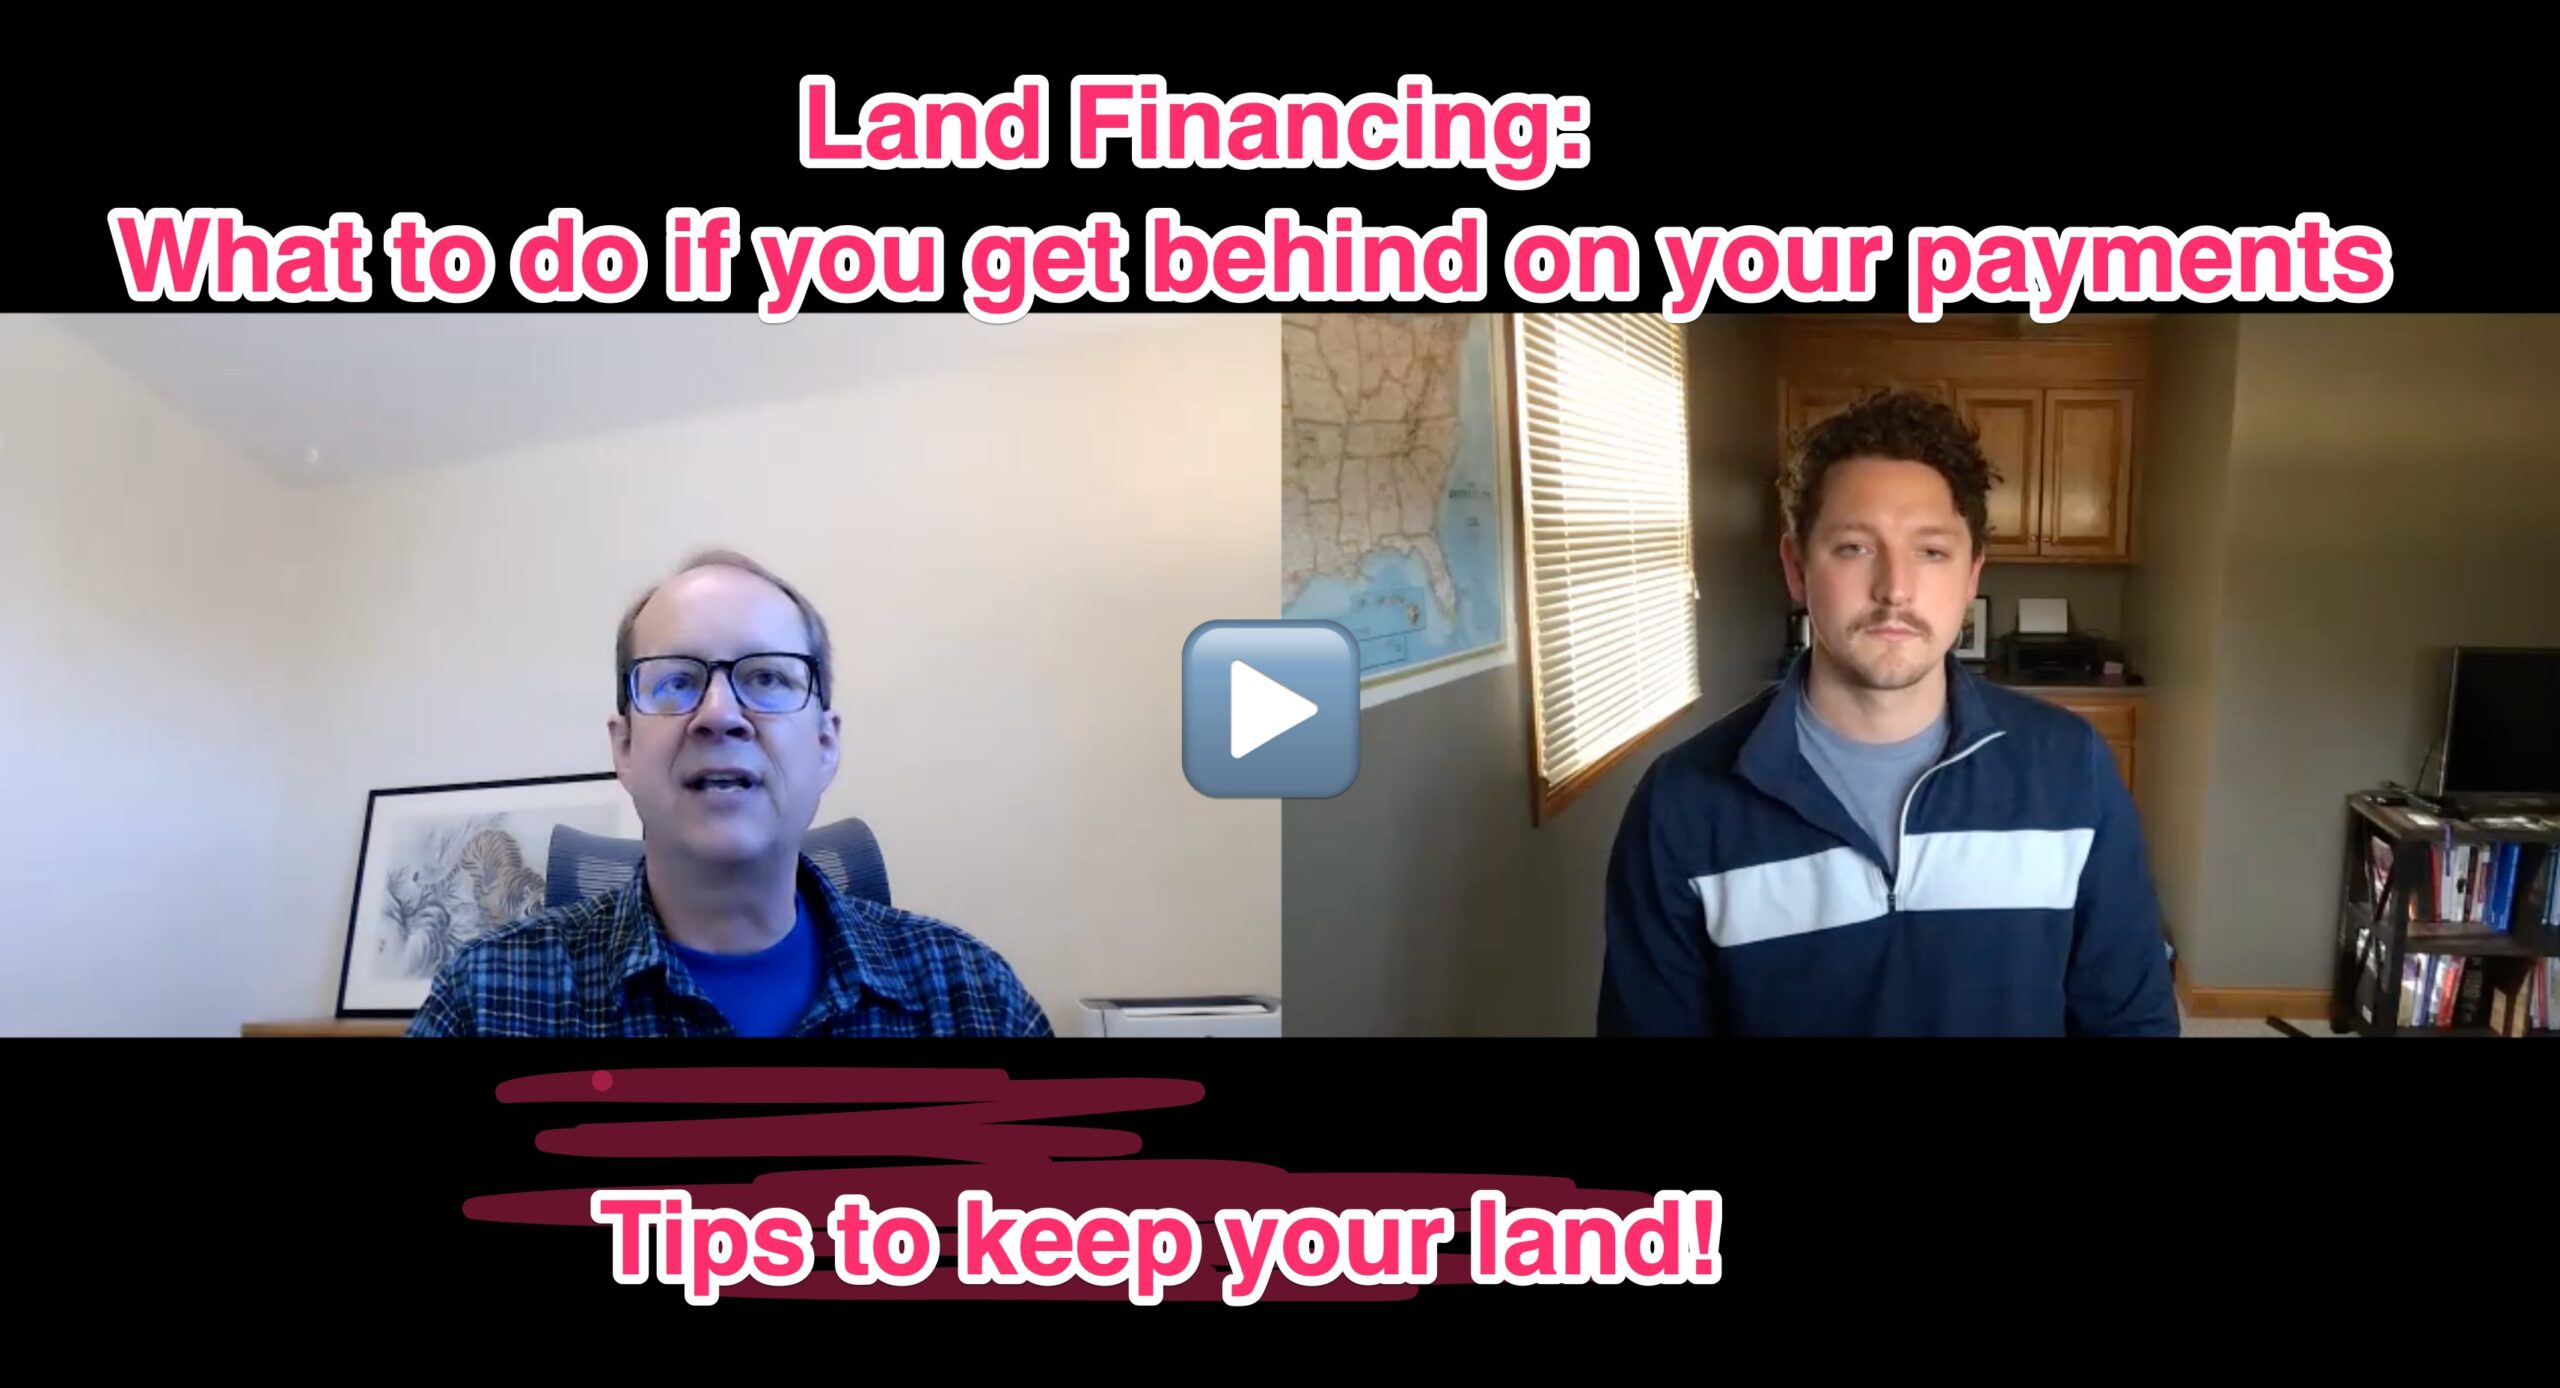 Land Financing Tips